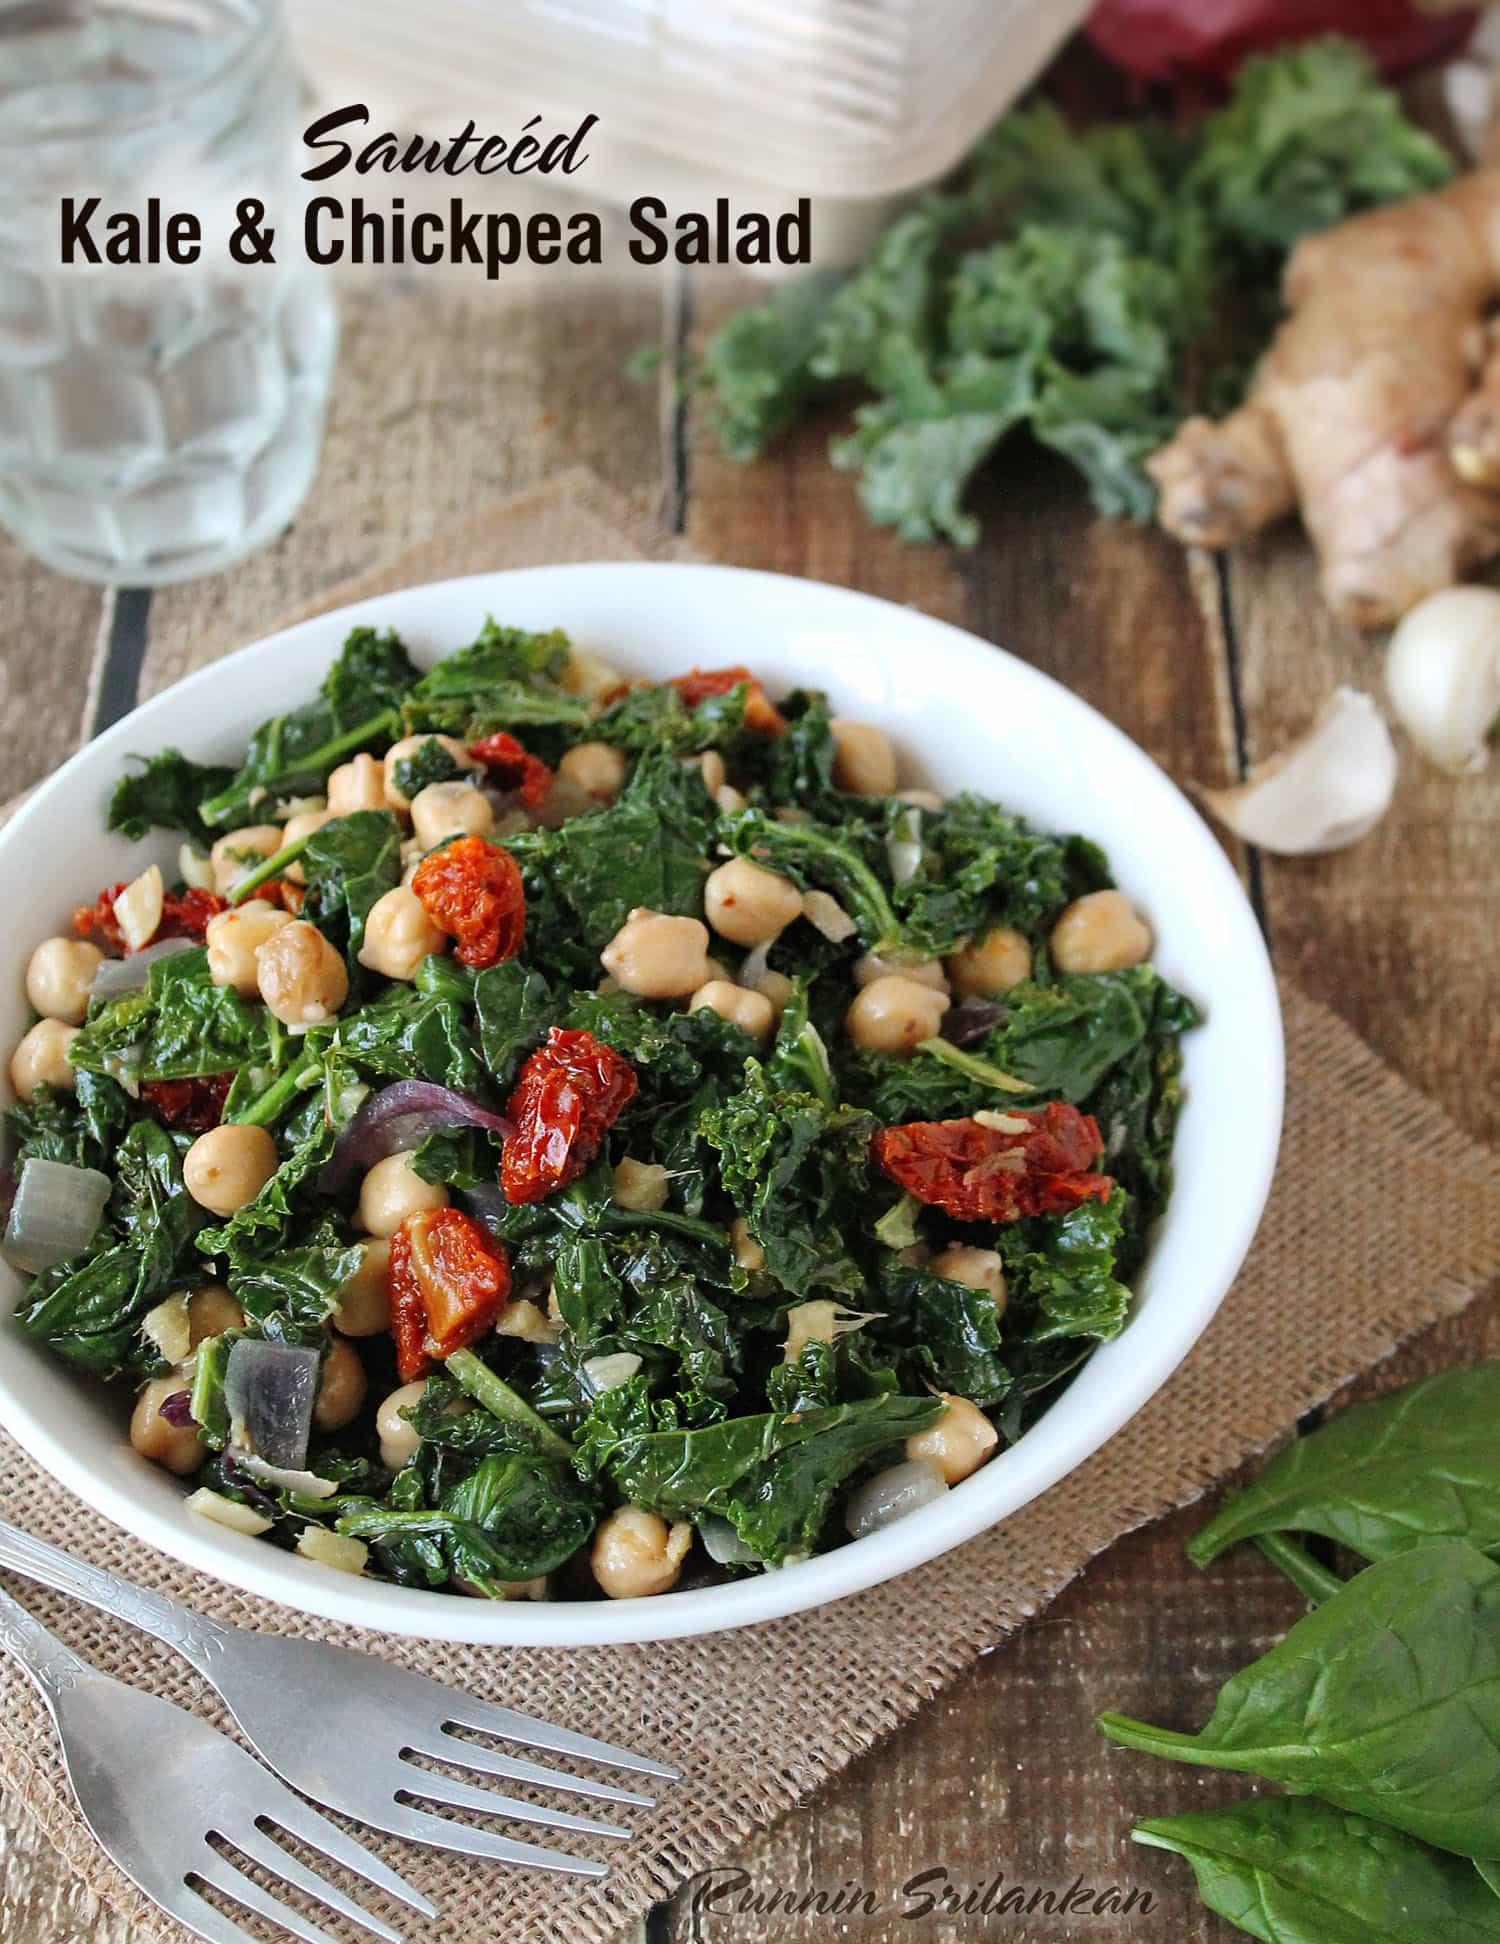 Sauteed-Kale-Chickpea-2-ways-#HeatAndEat